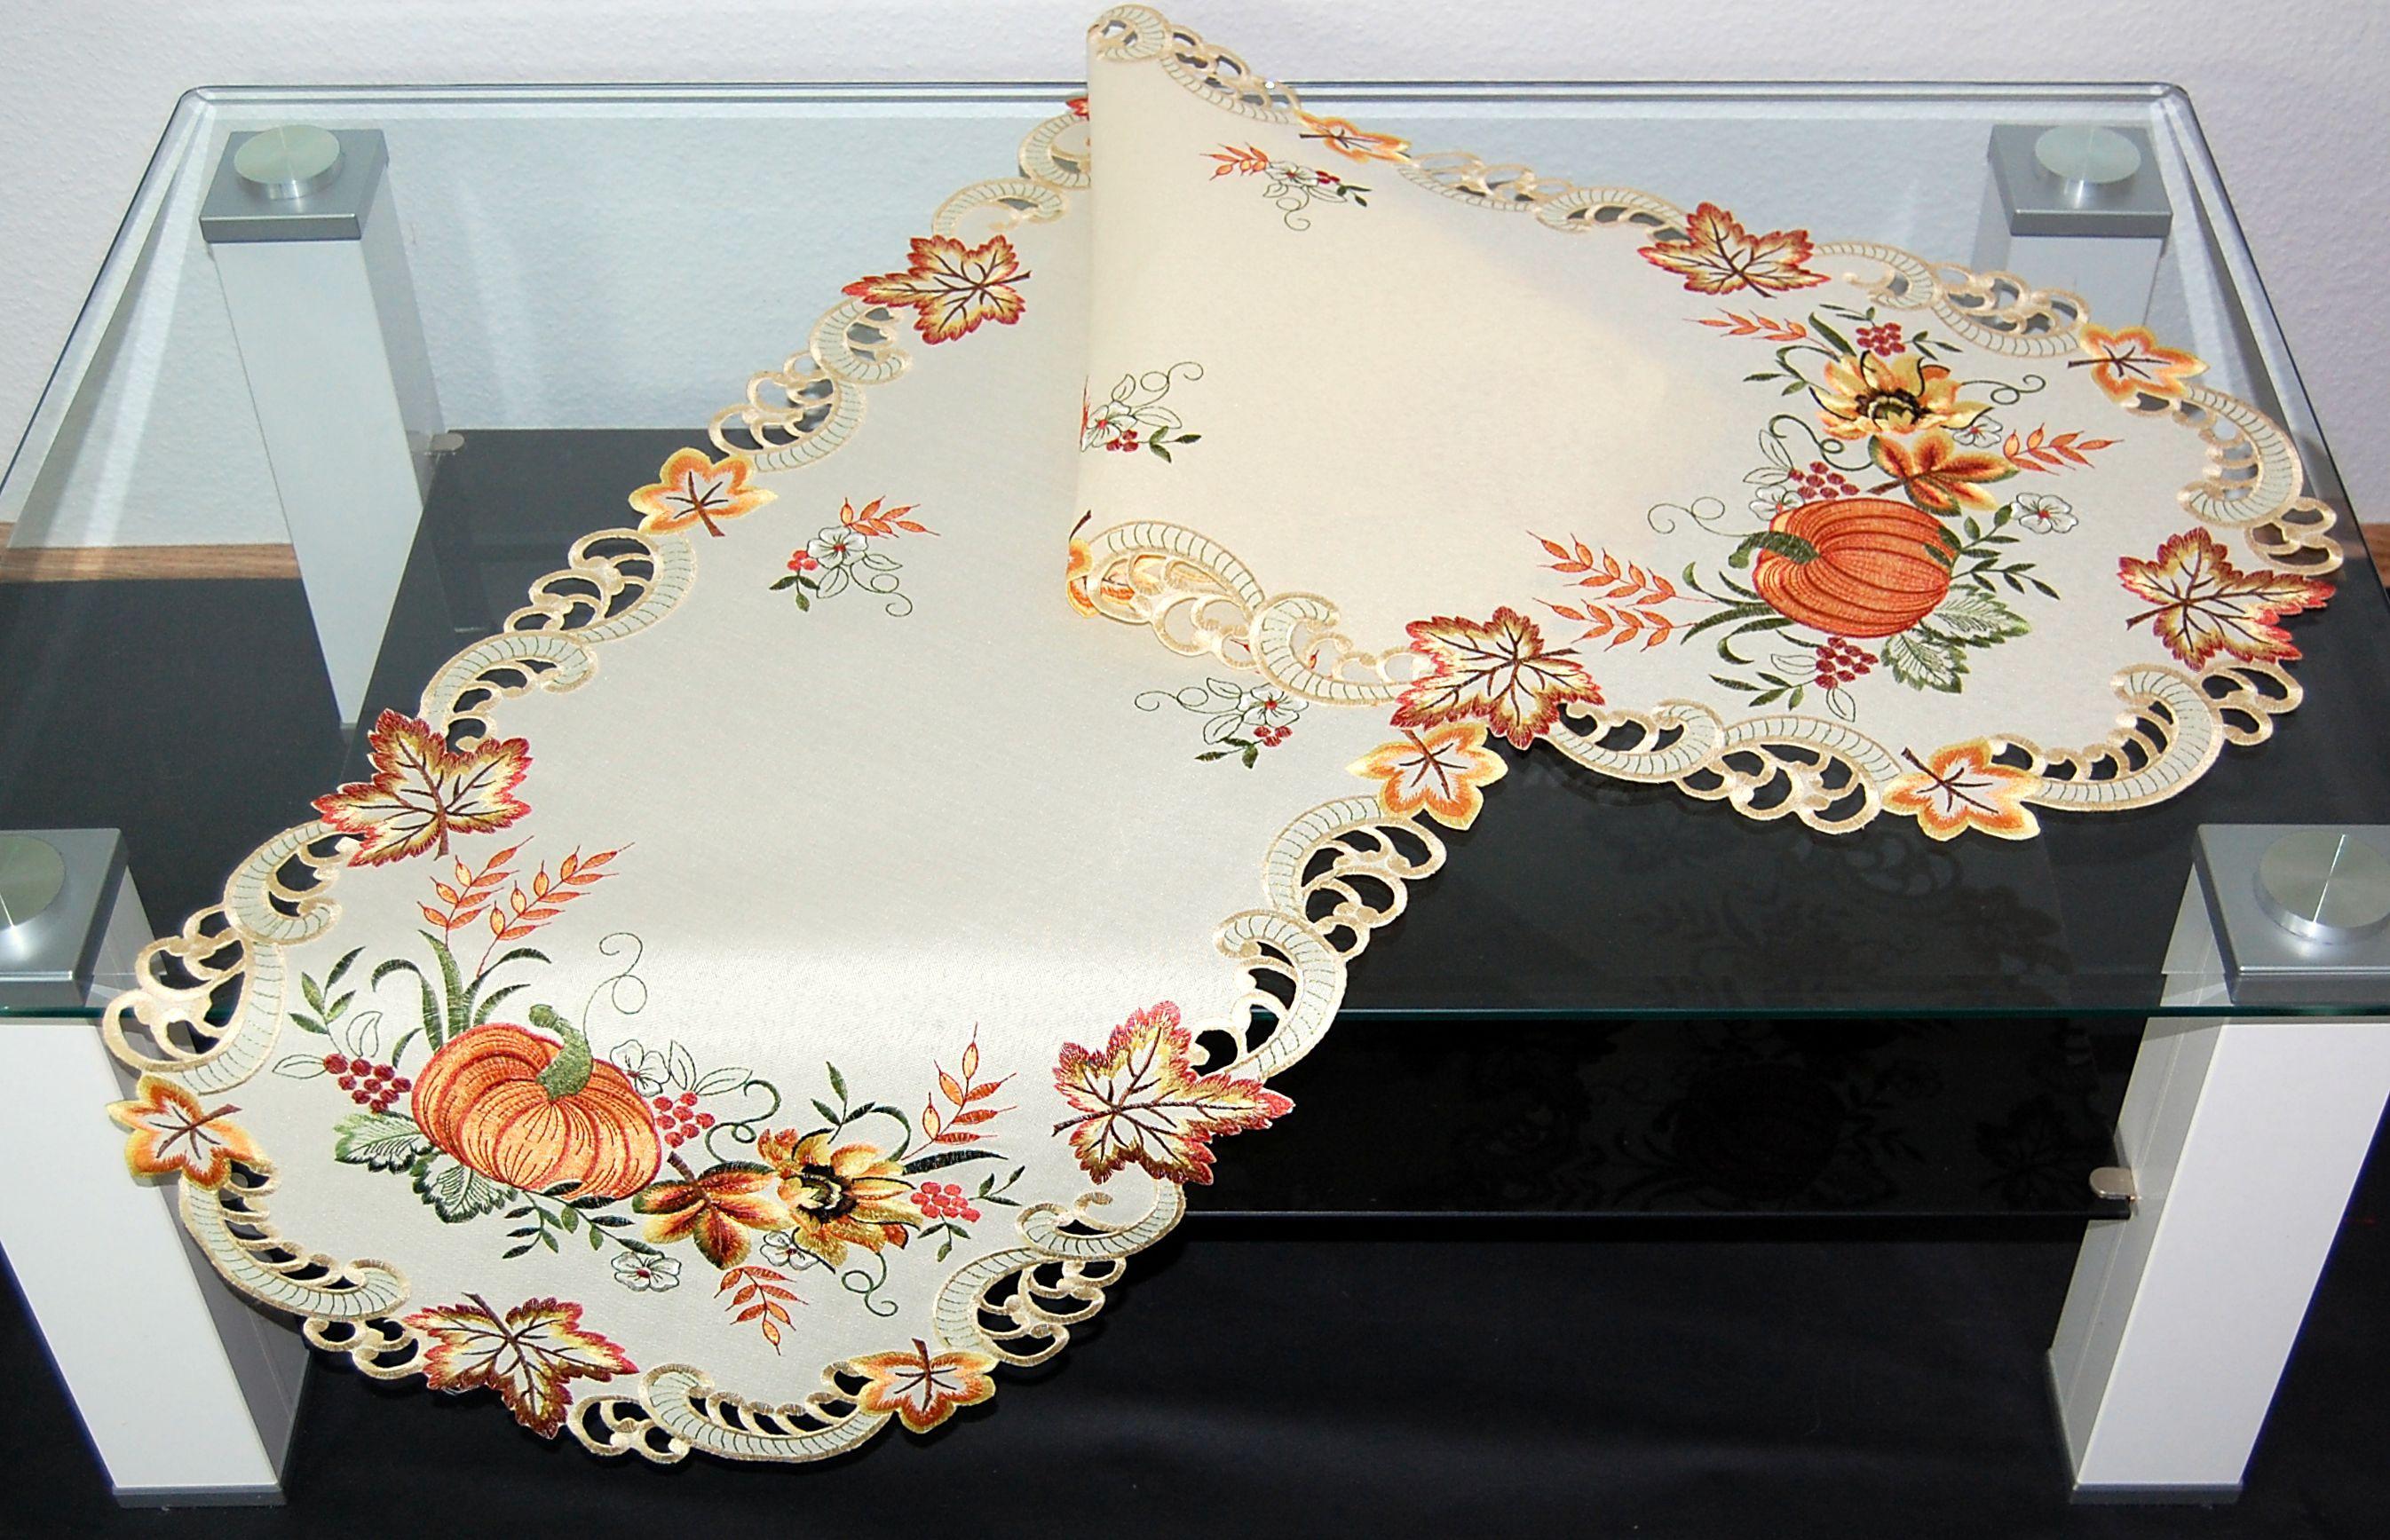 tischdecke creme k rbis bunt gestickt herbst mitteldecke. Black Bedroom Furniture Sets. Home Design Ideas